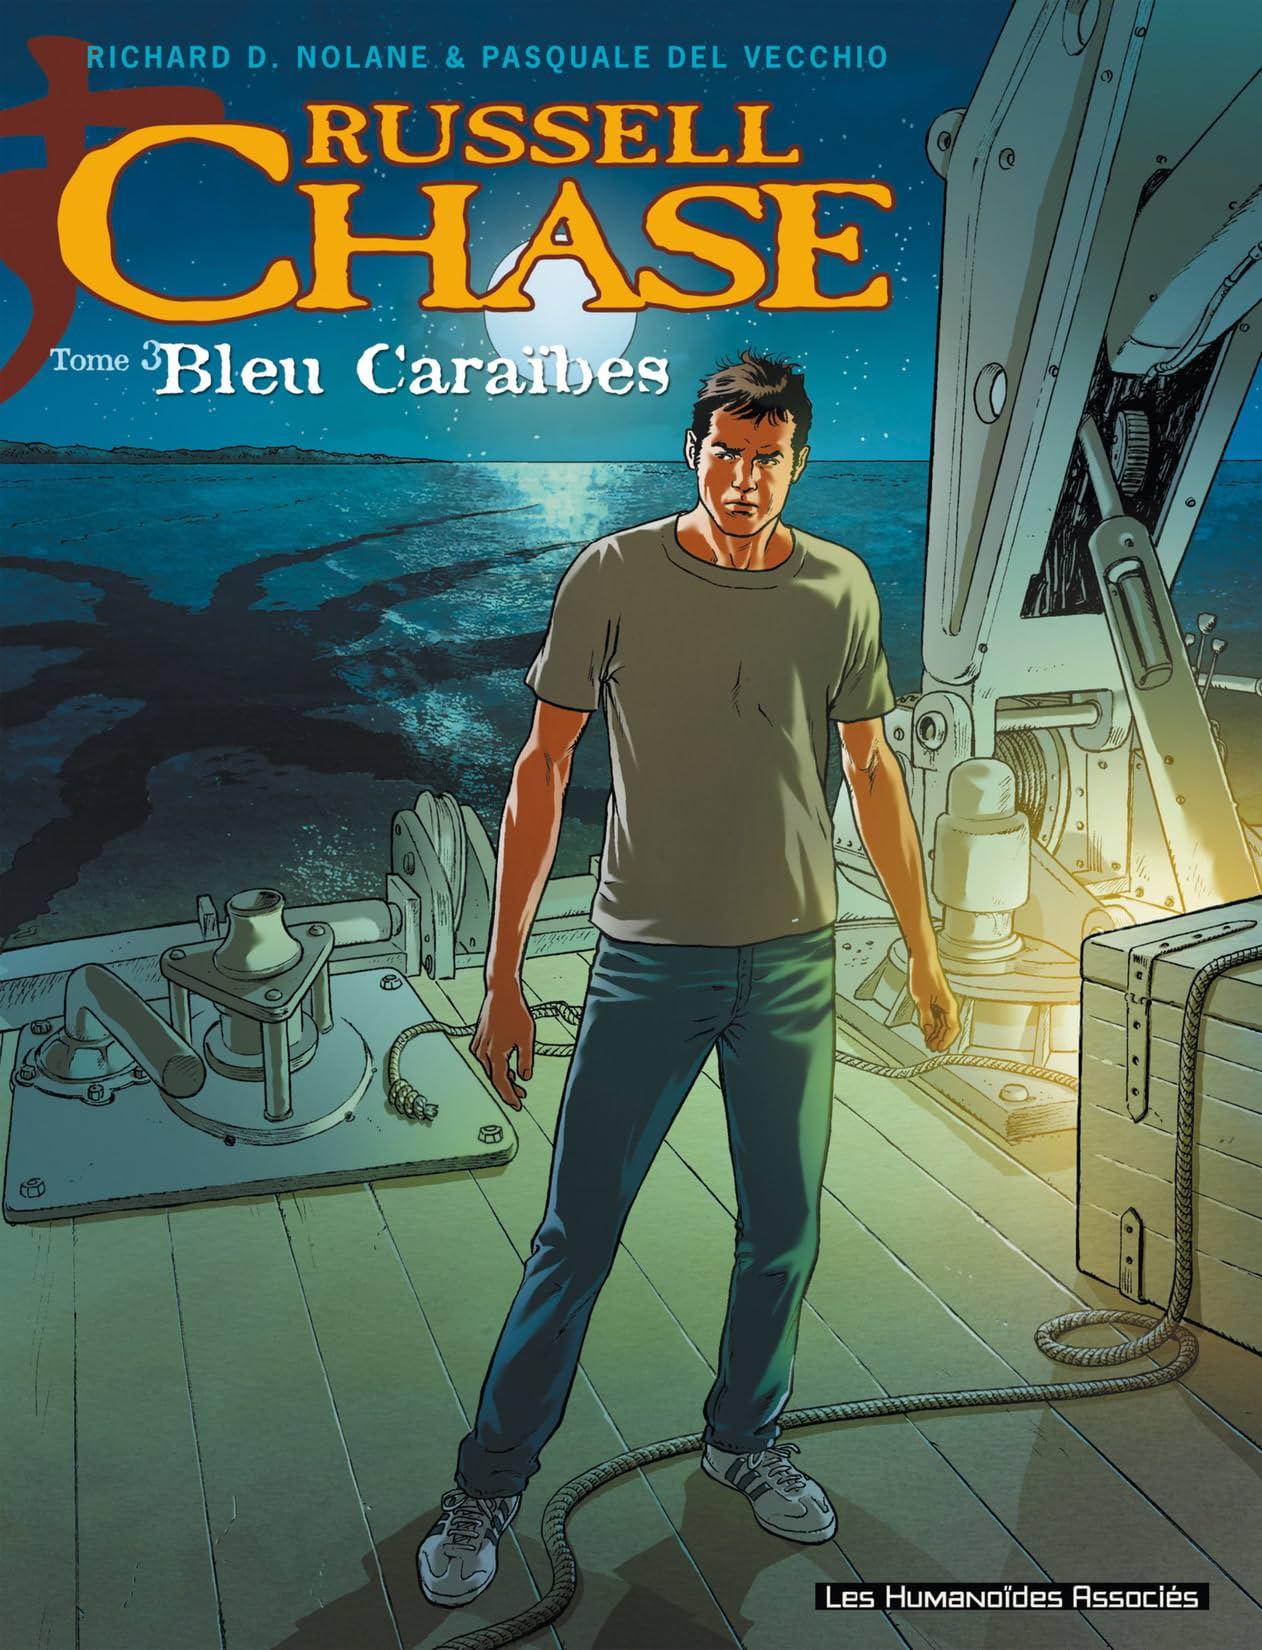 Russell Chase Vol. 3: Bleu Caraïbes